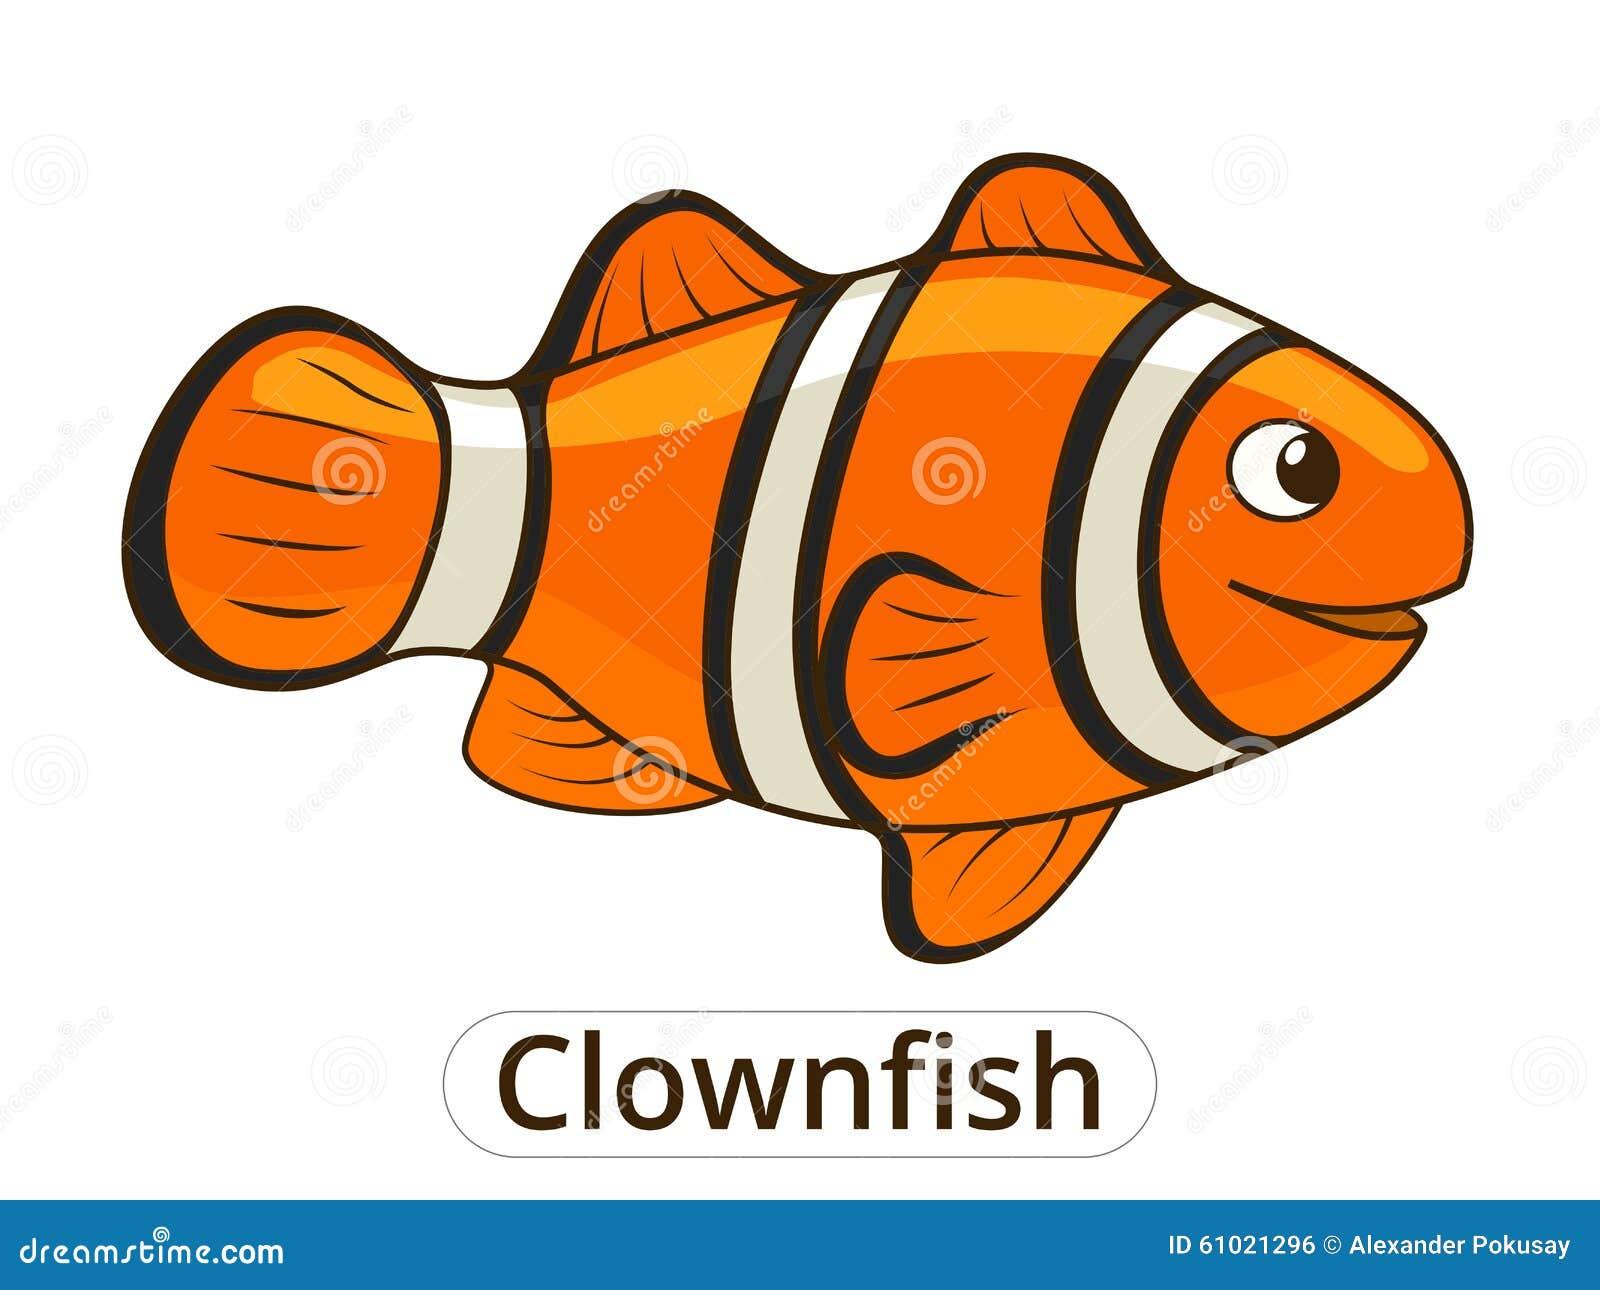 Clownfish Sea Fish Cartoon Illustration Stock Vector ...